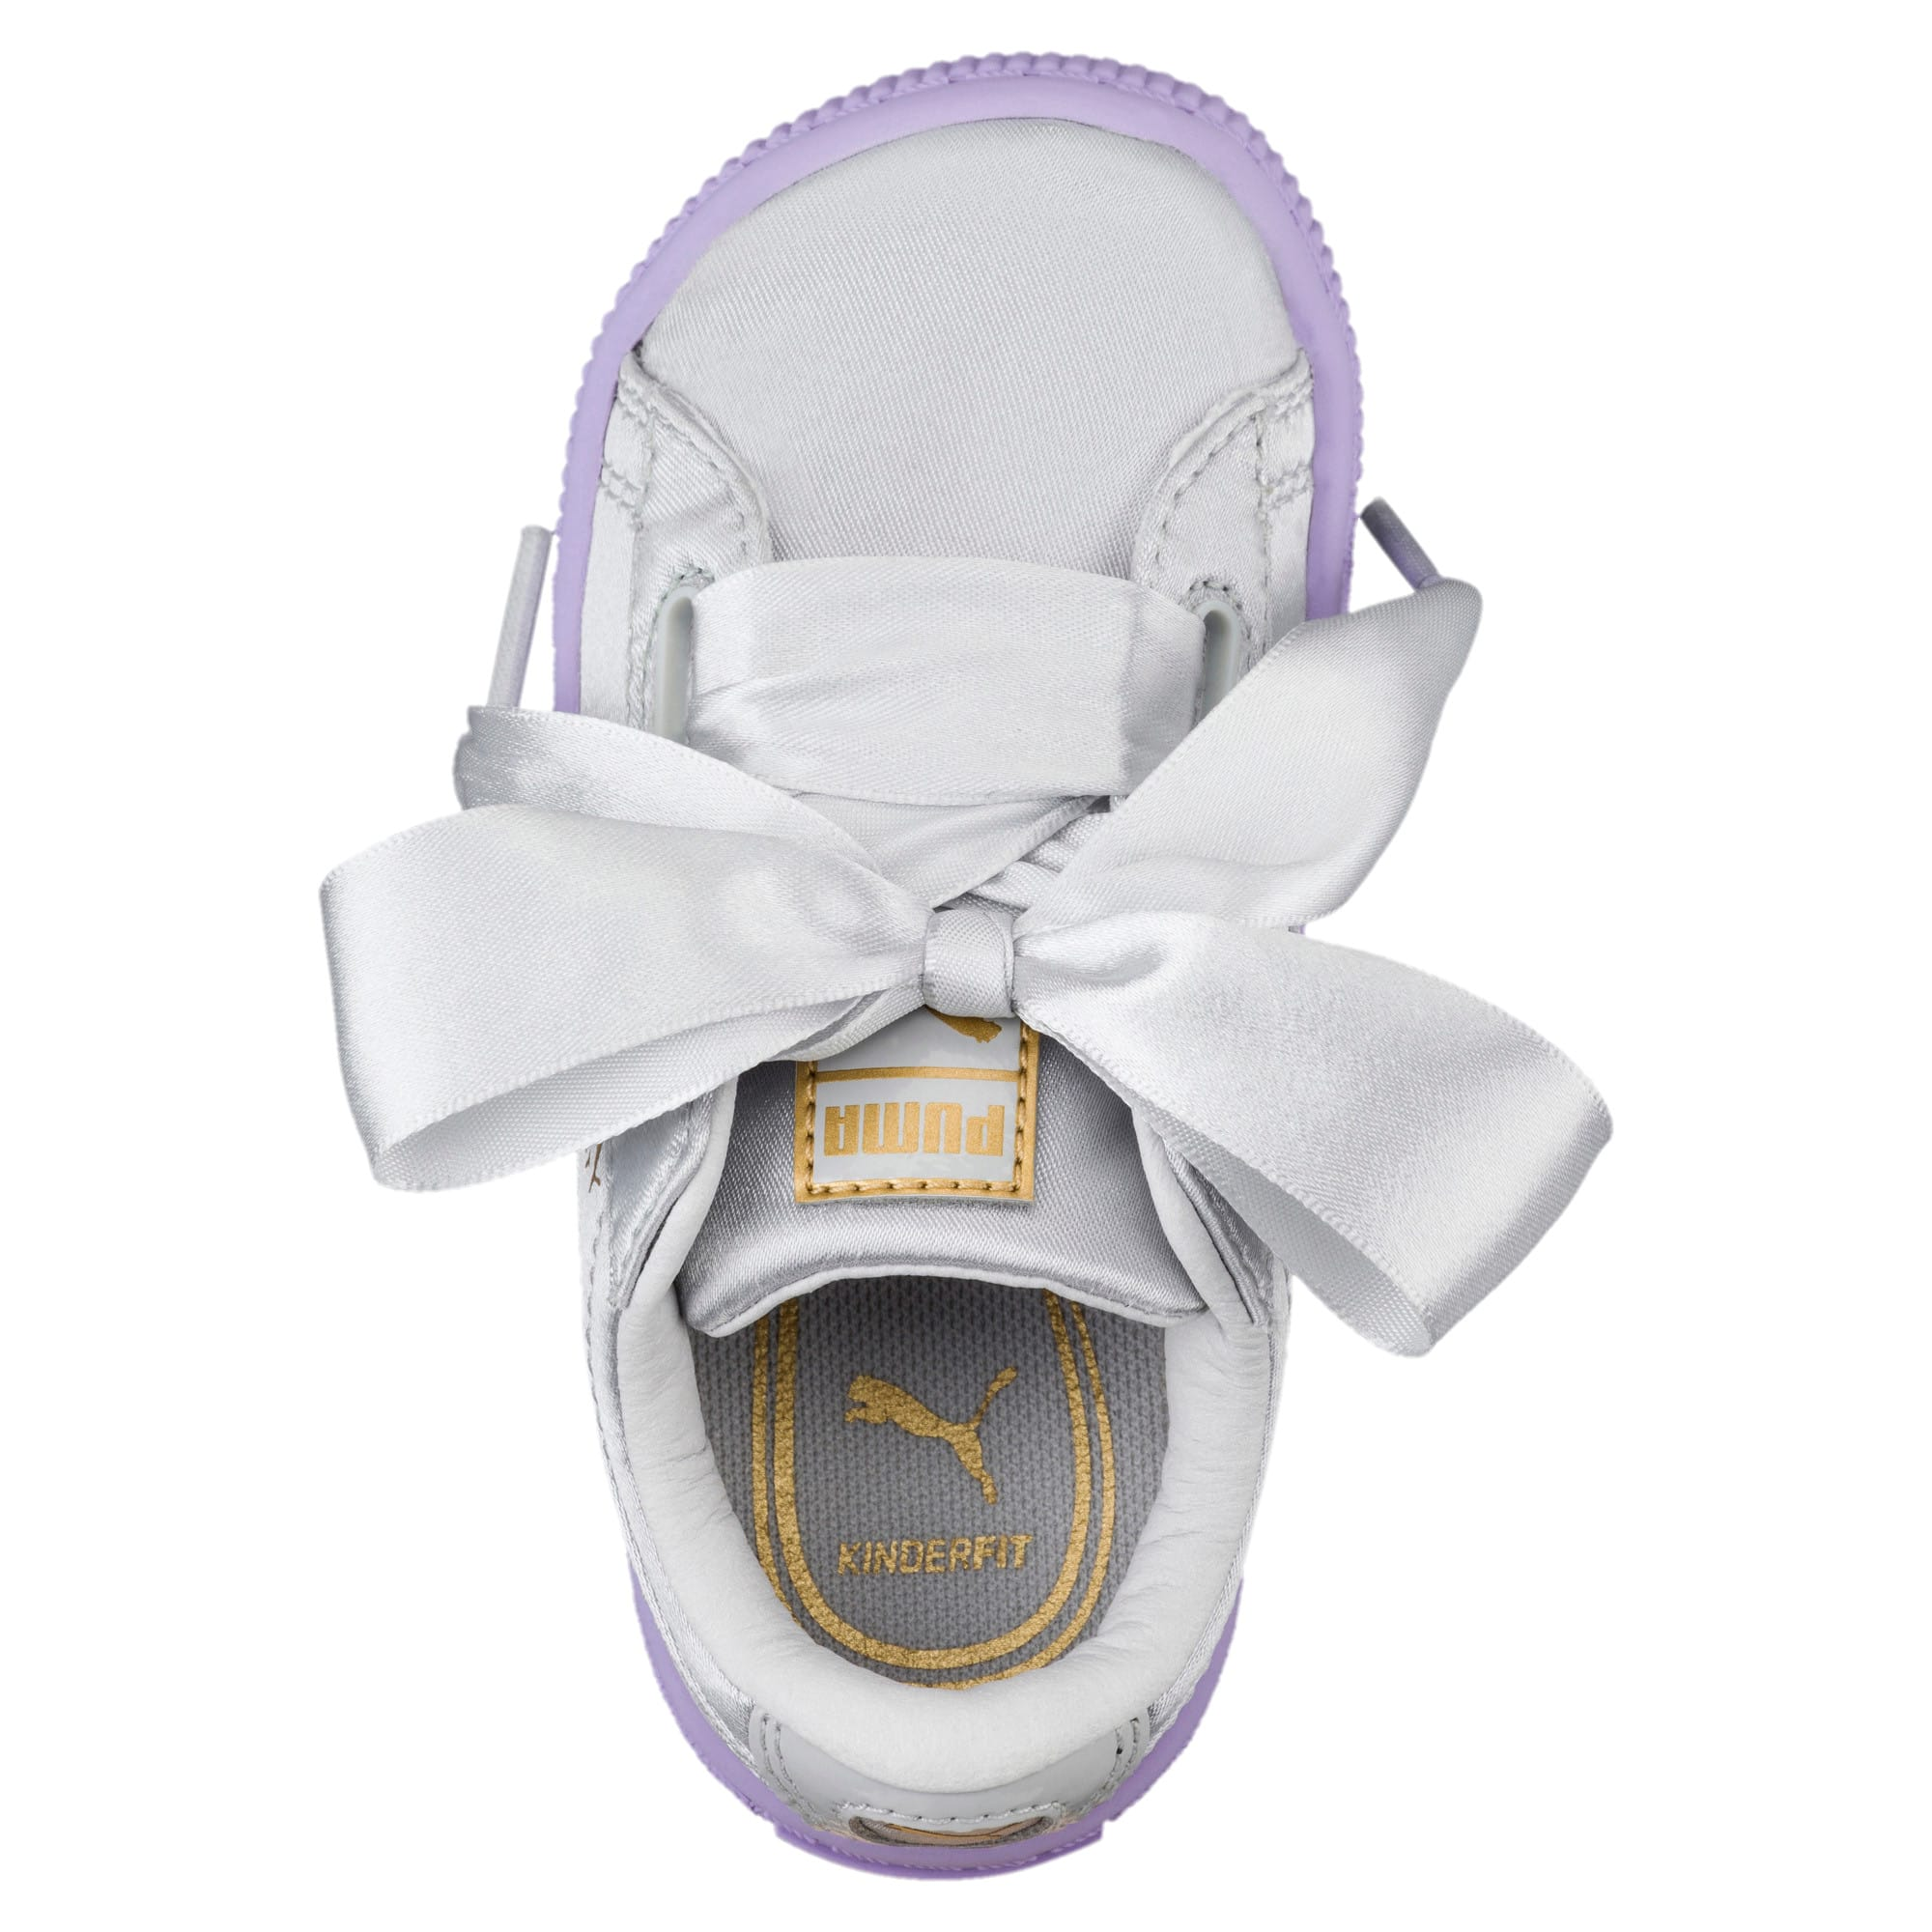 Thumbnail 5 of Basket Heart Toddler Shoes, Glacier Gray-Glacier Gray, medium